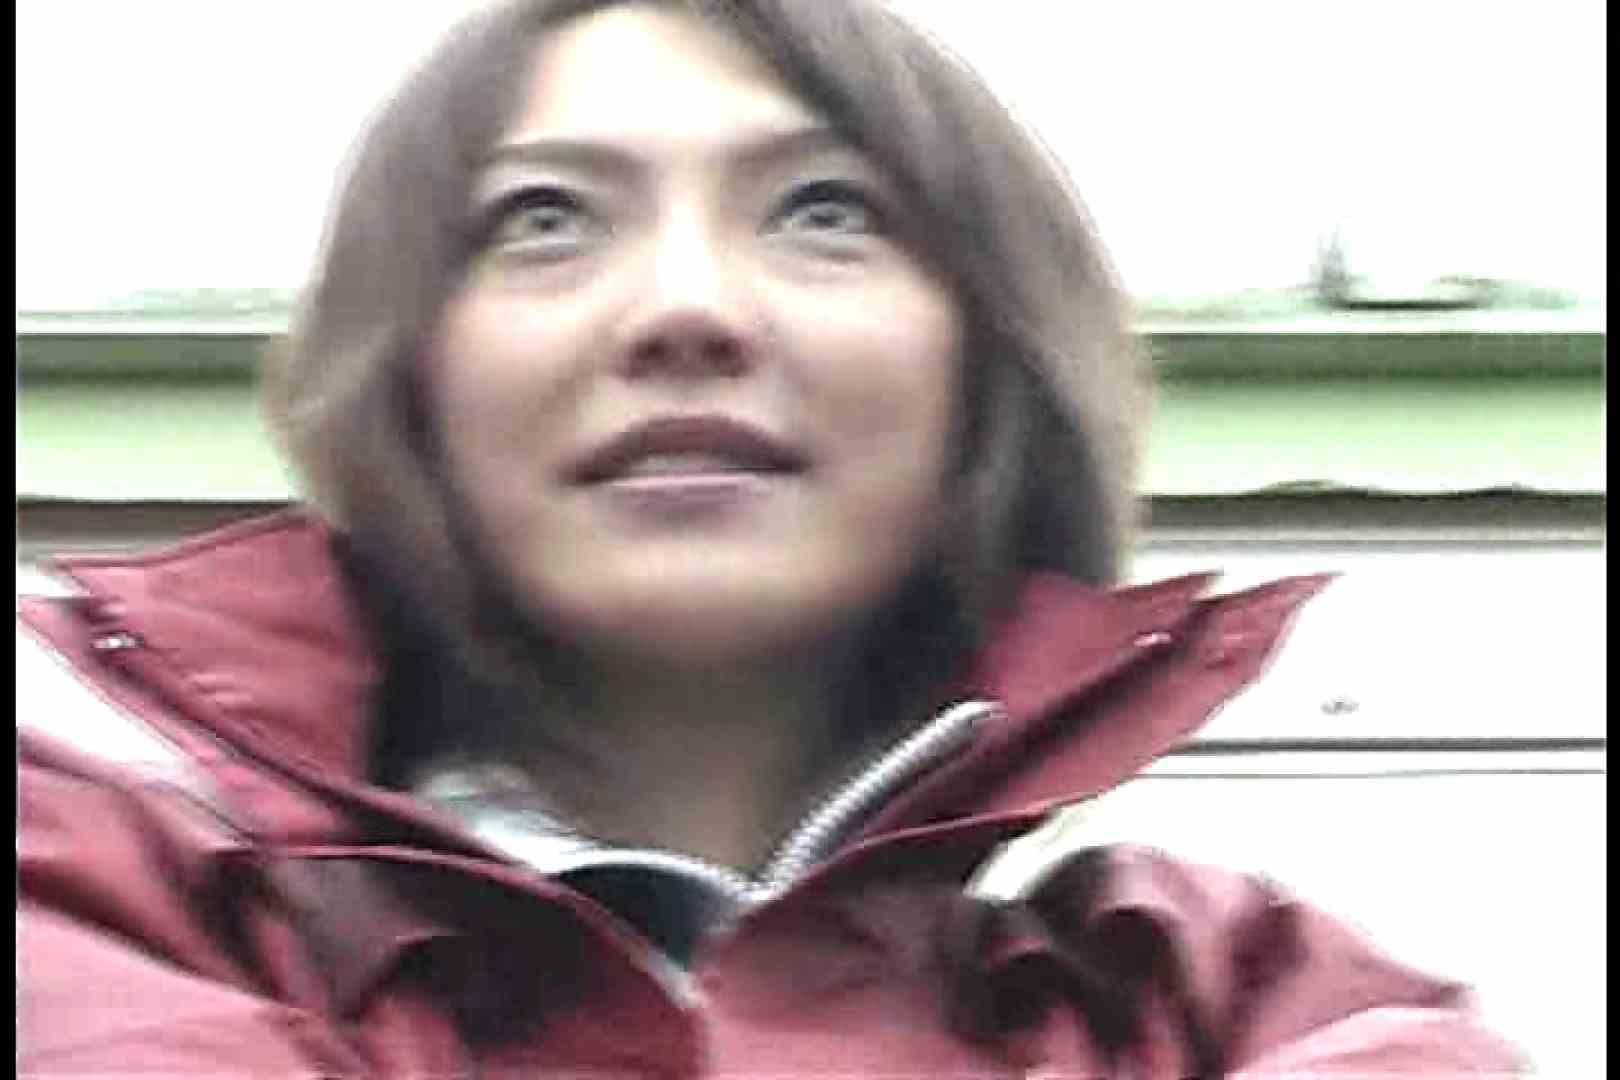 RQカメラ地獄Vol.3 レースクイーン編 ワレメ動画紹介 79画像 23